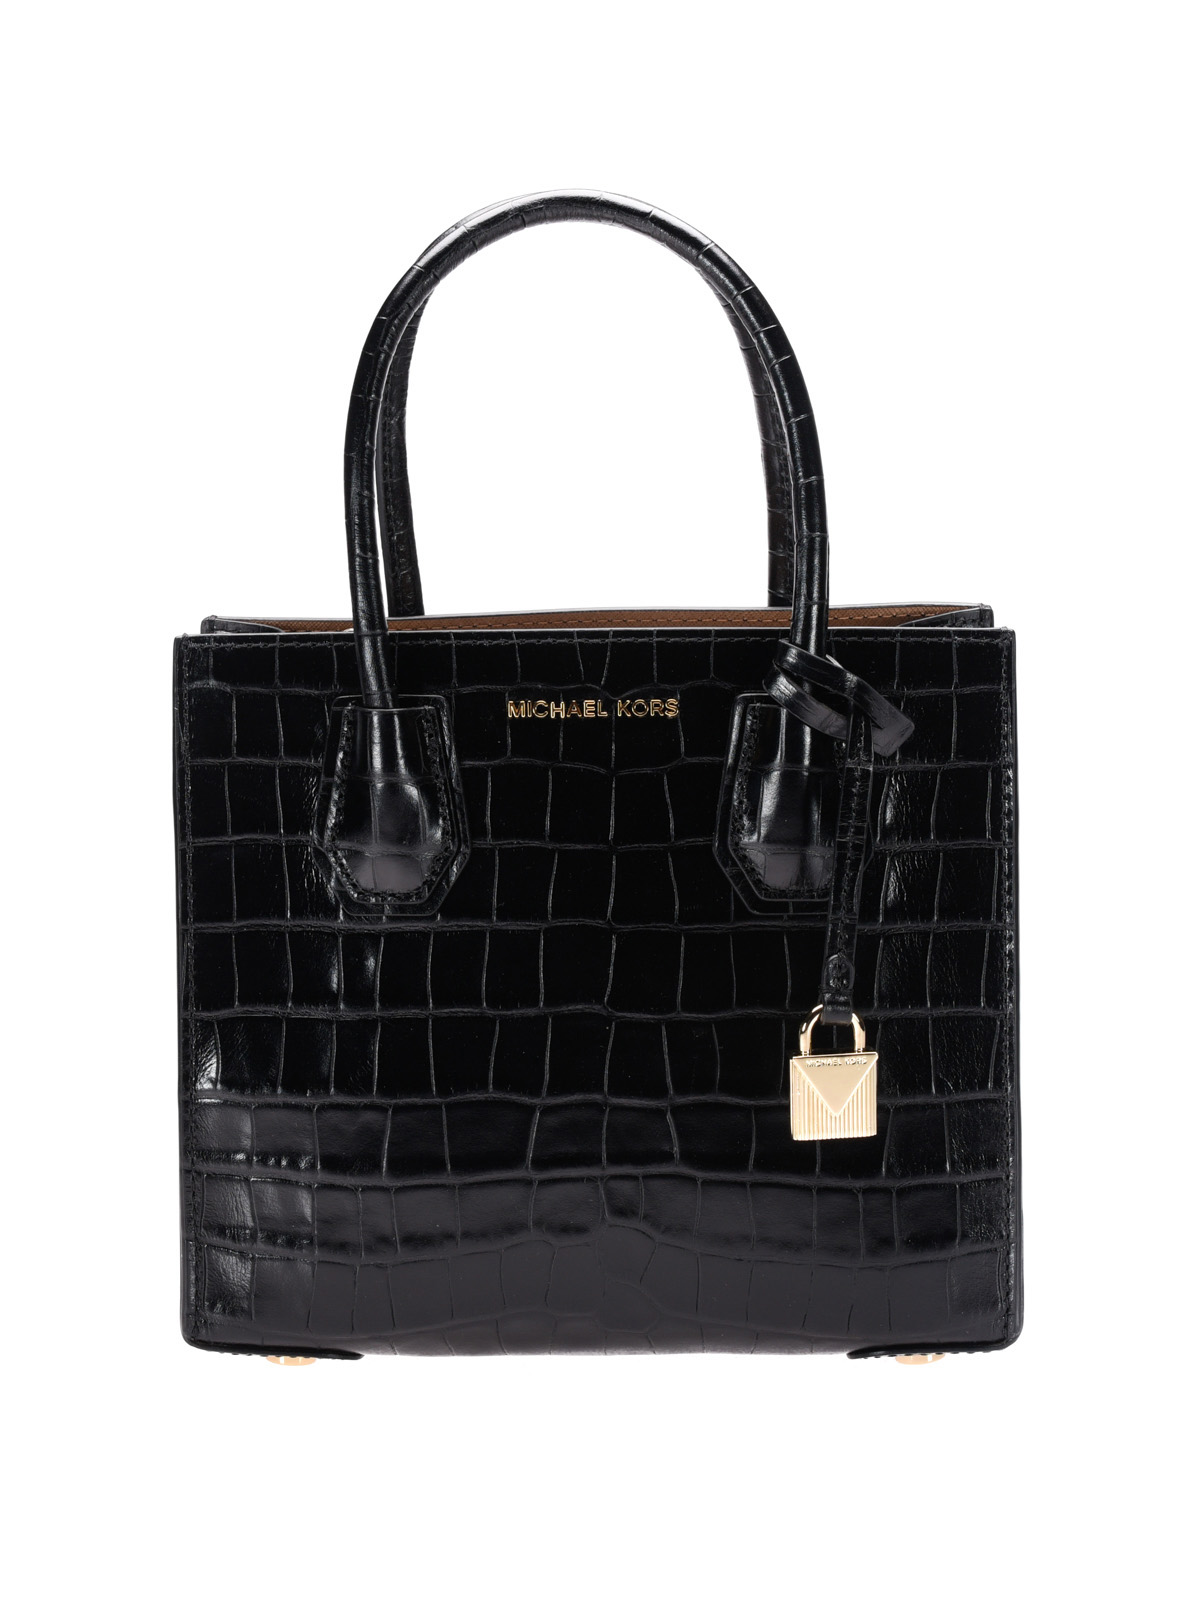 Michael Kors - Mercer croco print leather bag - totes bags ...